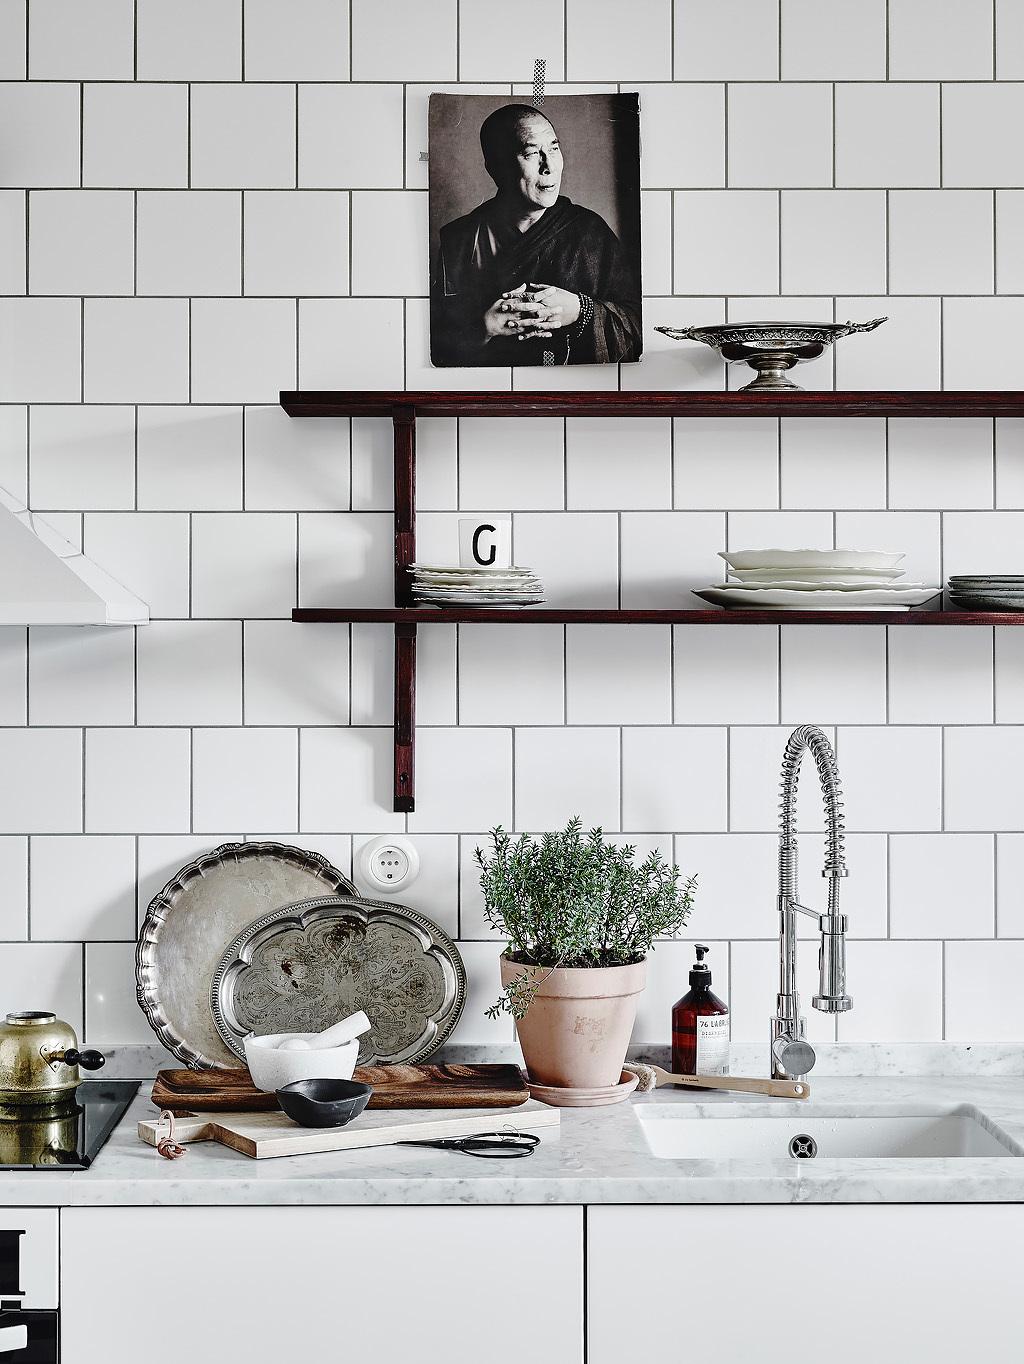 home-tour-splendide-decoraiton-cuisine-madmeoiselle-claudine